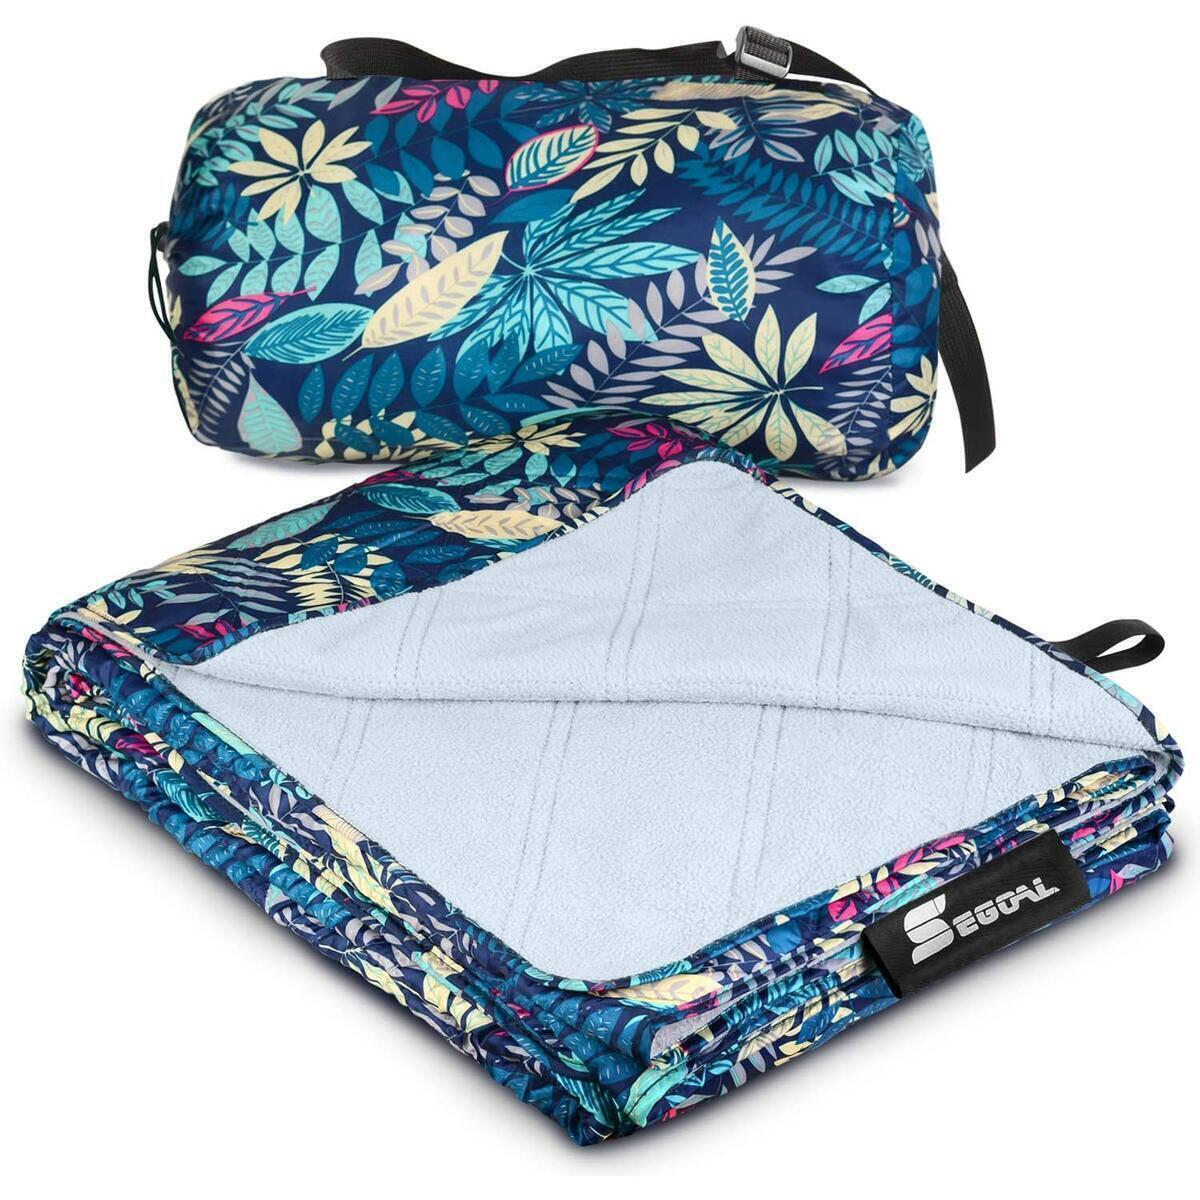 BLUE Pattern Outdoor Blanket Picnic 78.7''x 55.2'' Oversized Nylon Fleece Mat Waterproof (REBATE VALID WITHOUT COUPONS)